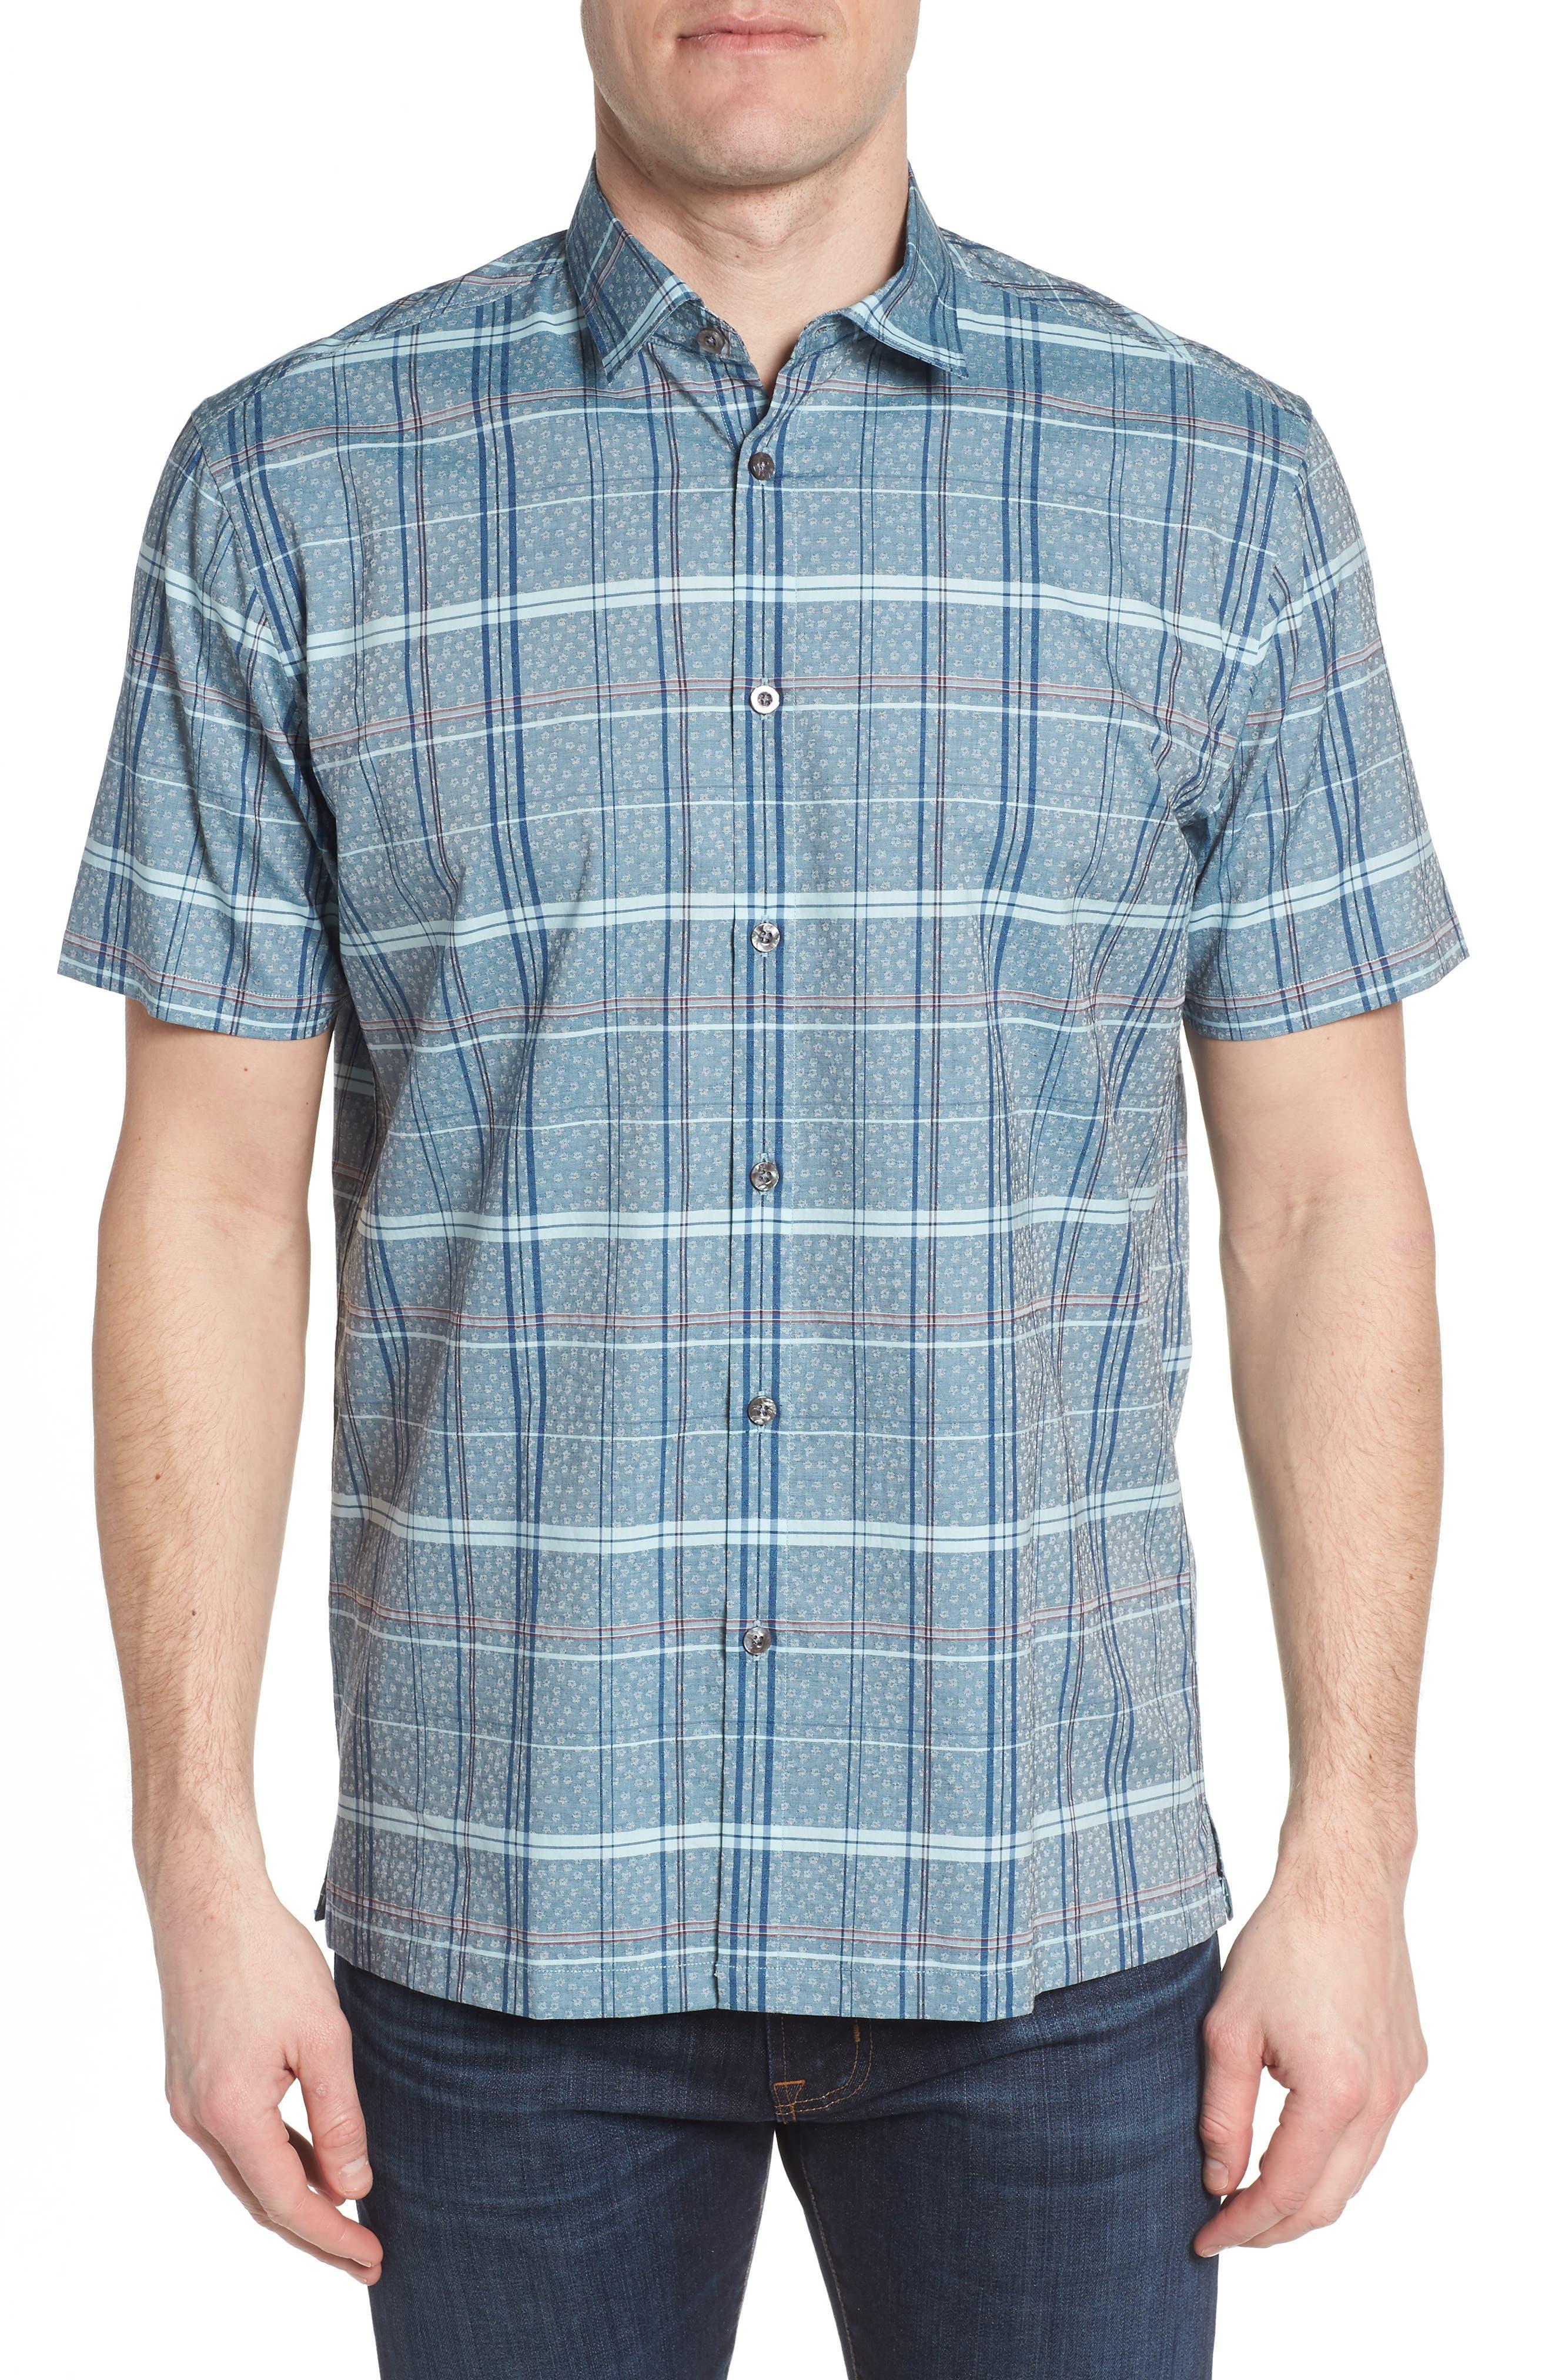 Coastaoro Vacaso Regular Fit Plaid Jacquard Sport Shirt